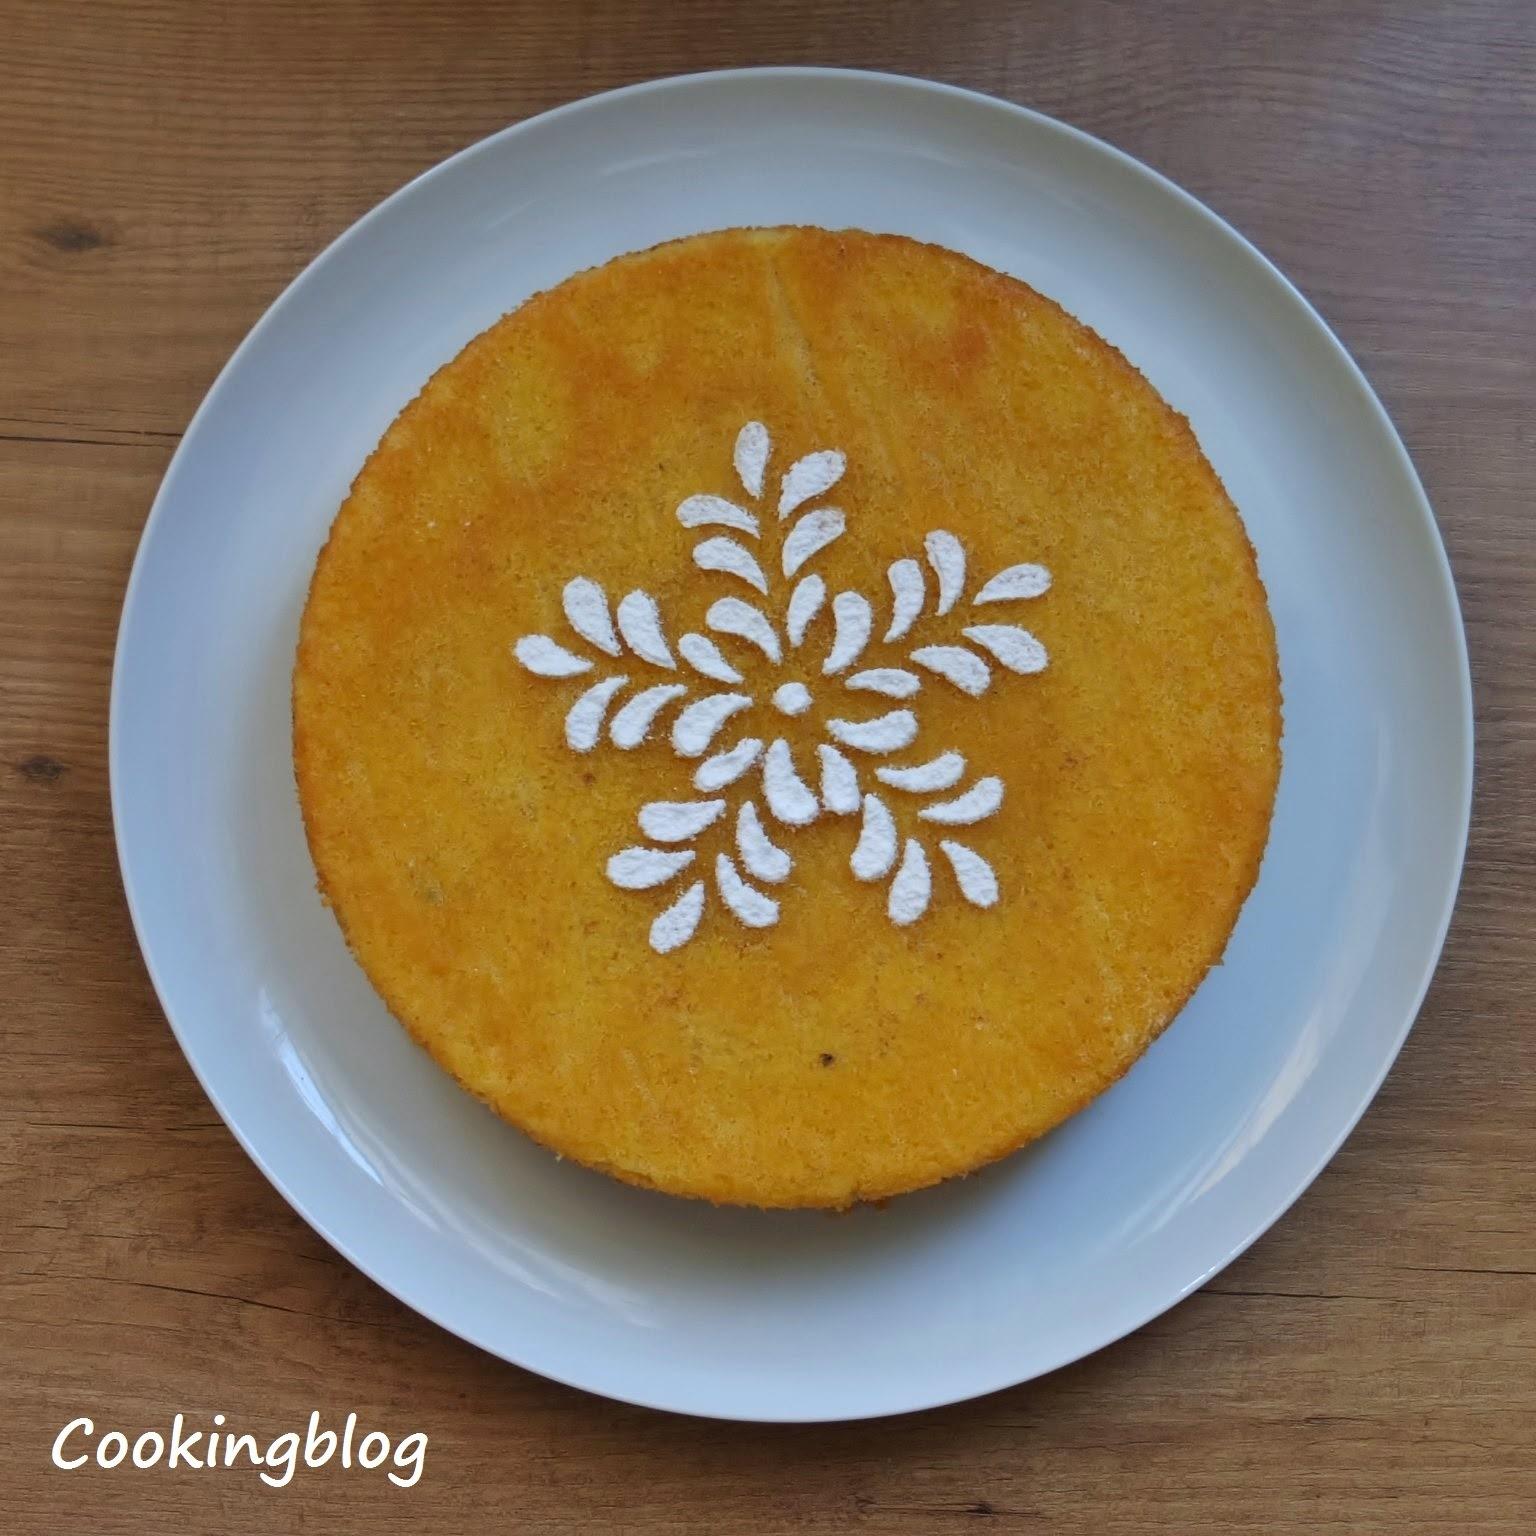 Bolo de amêndoa | Almond cake